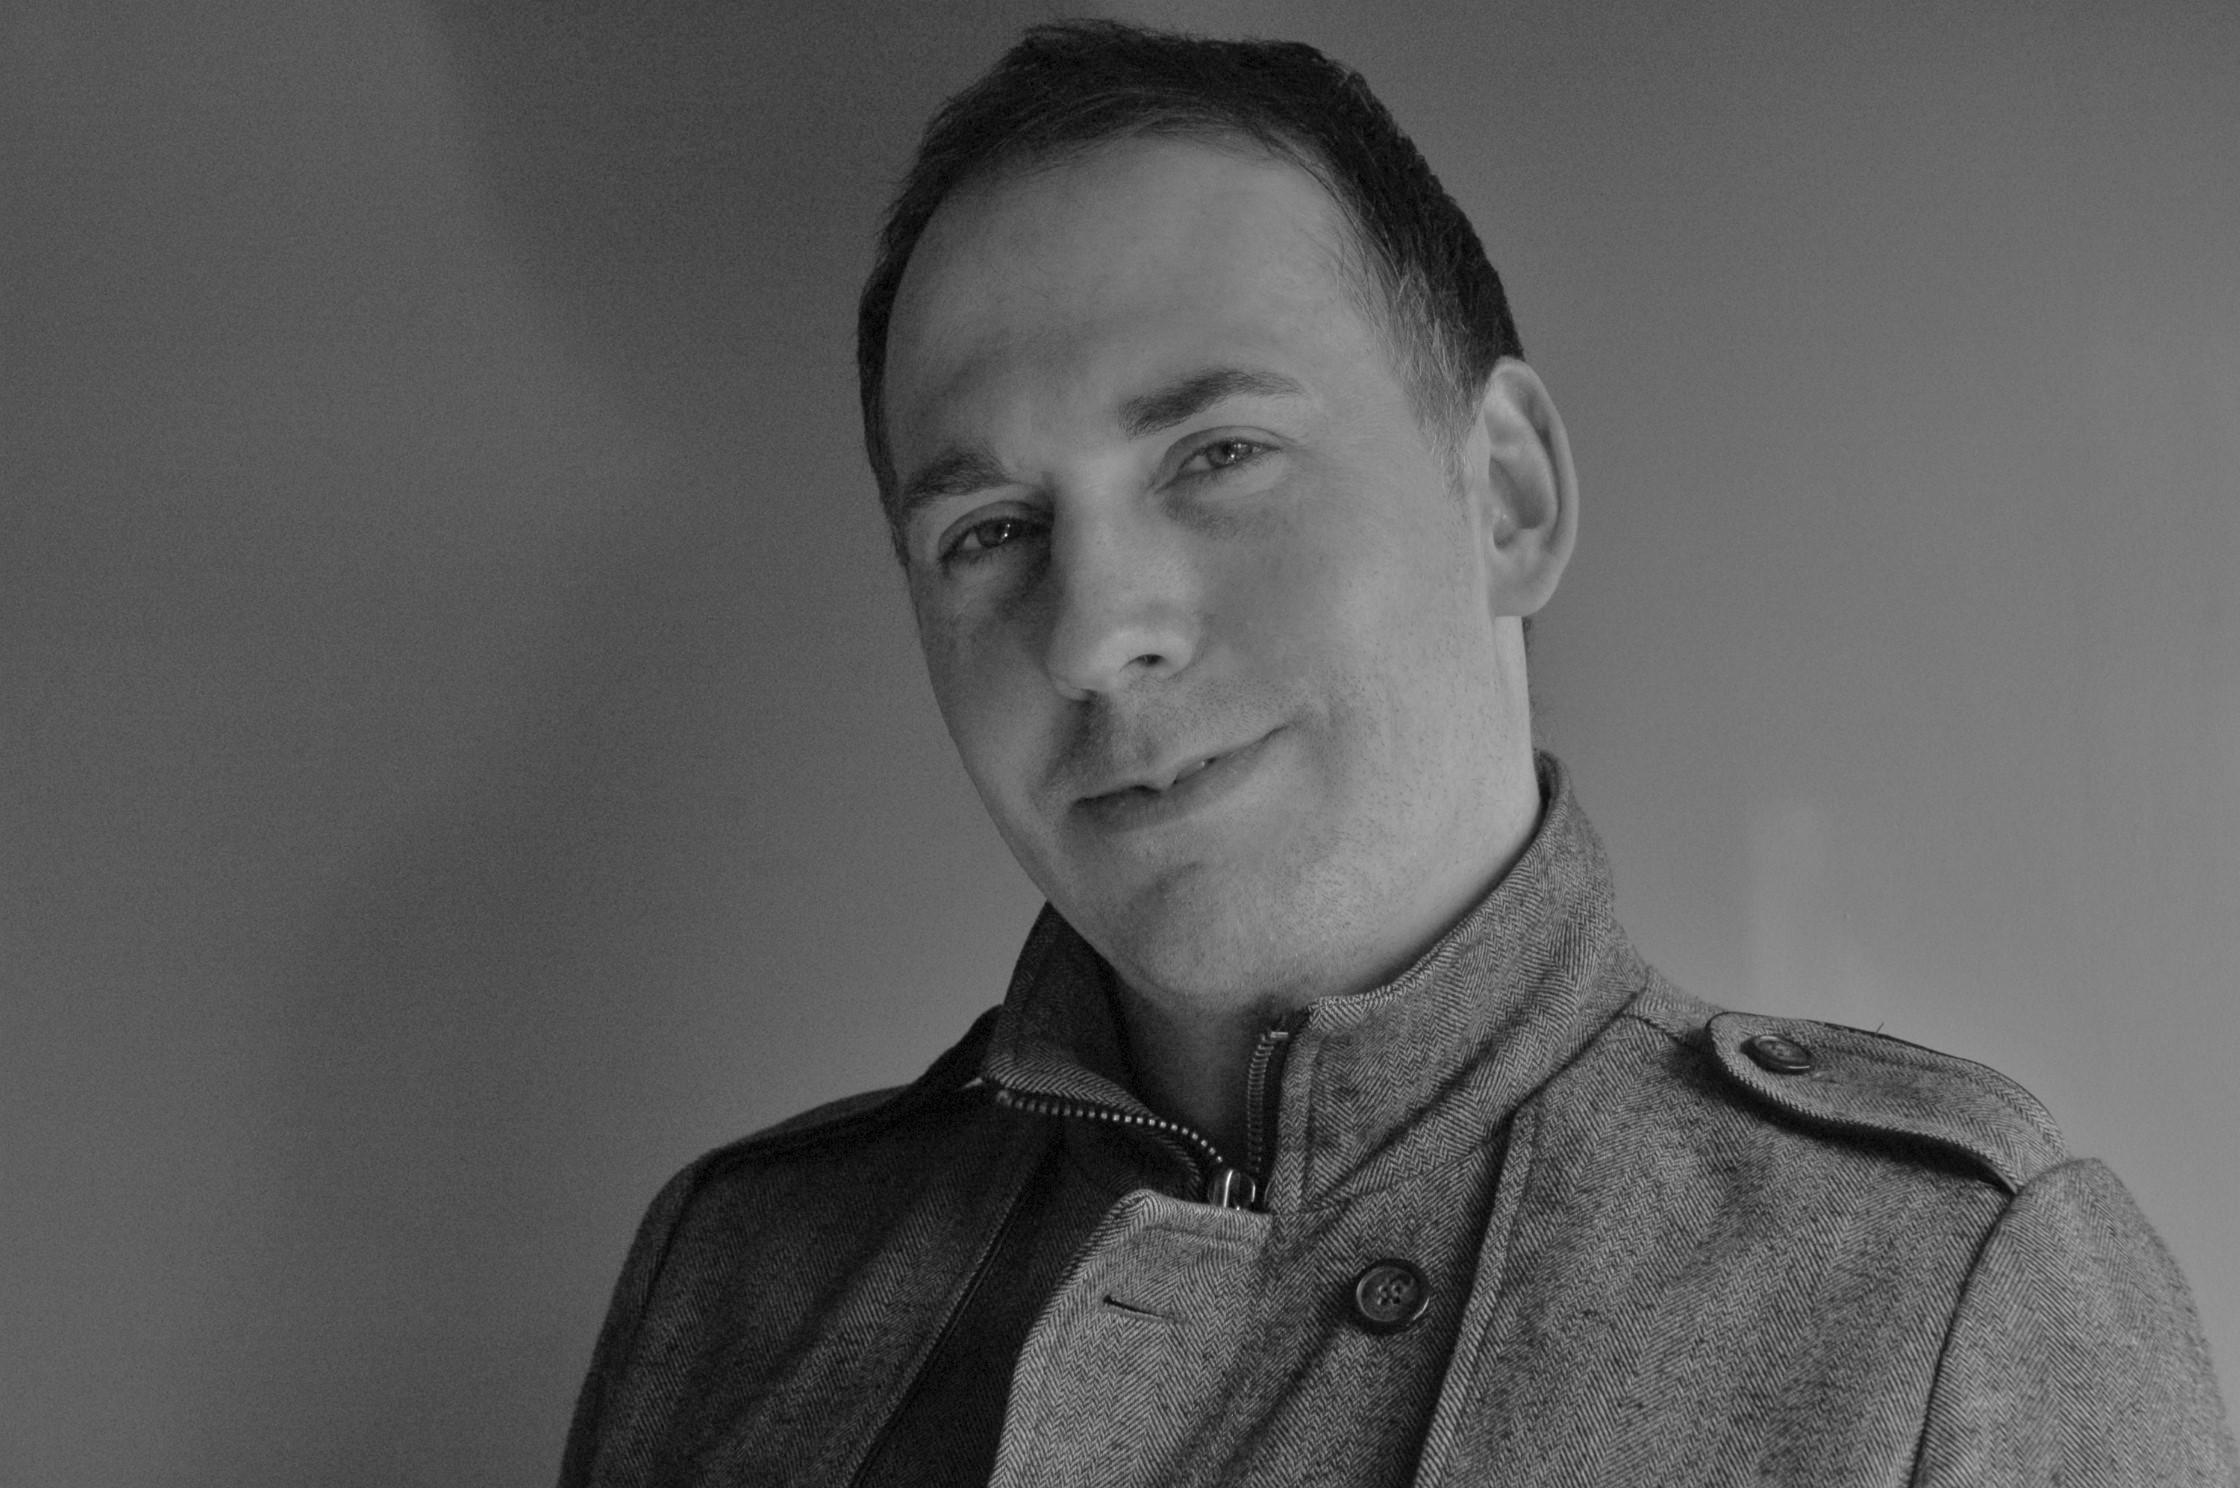 Peter Orton